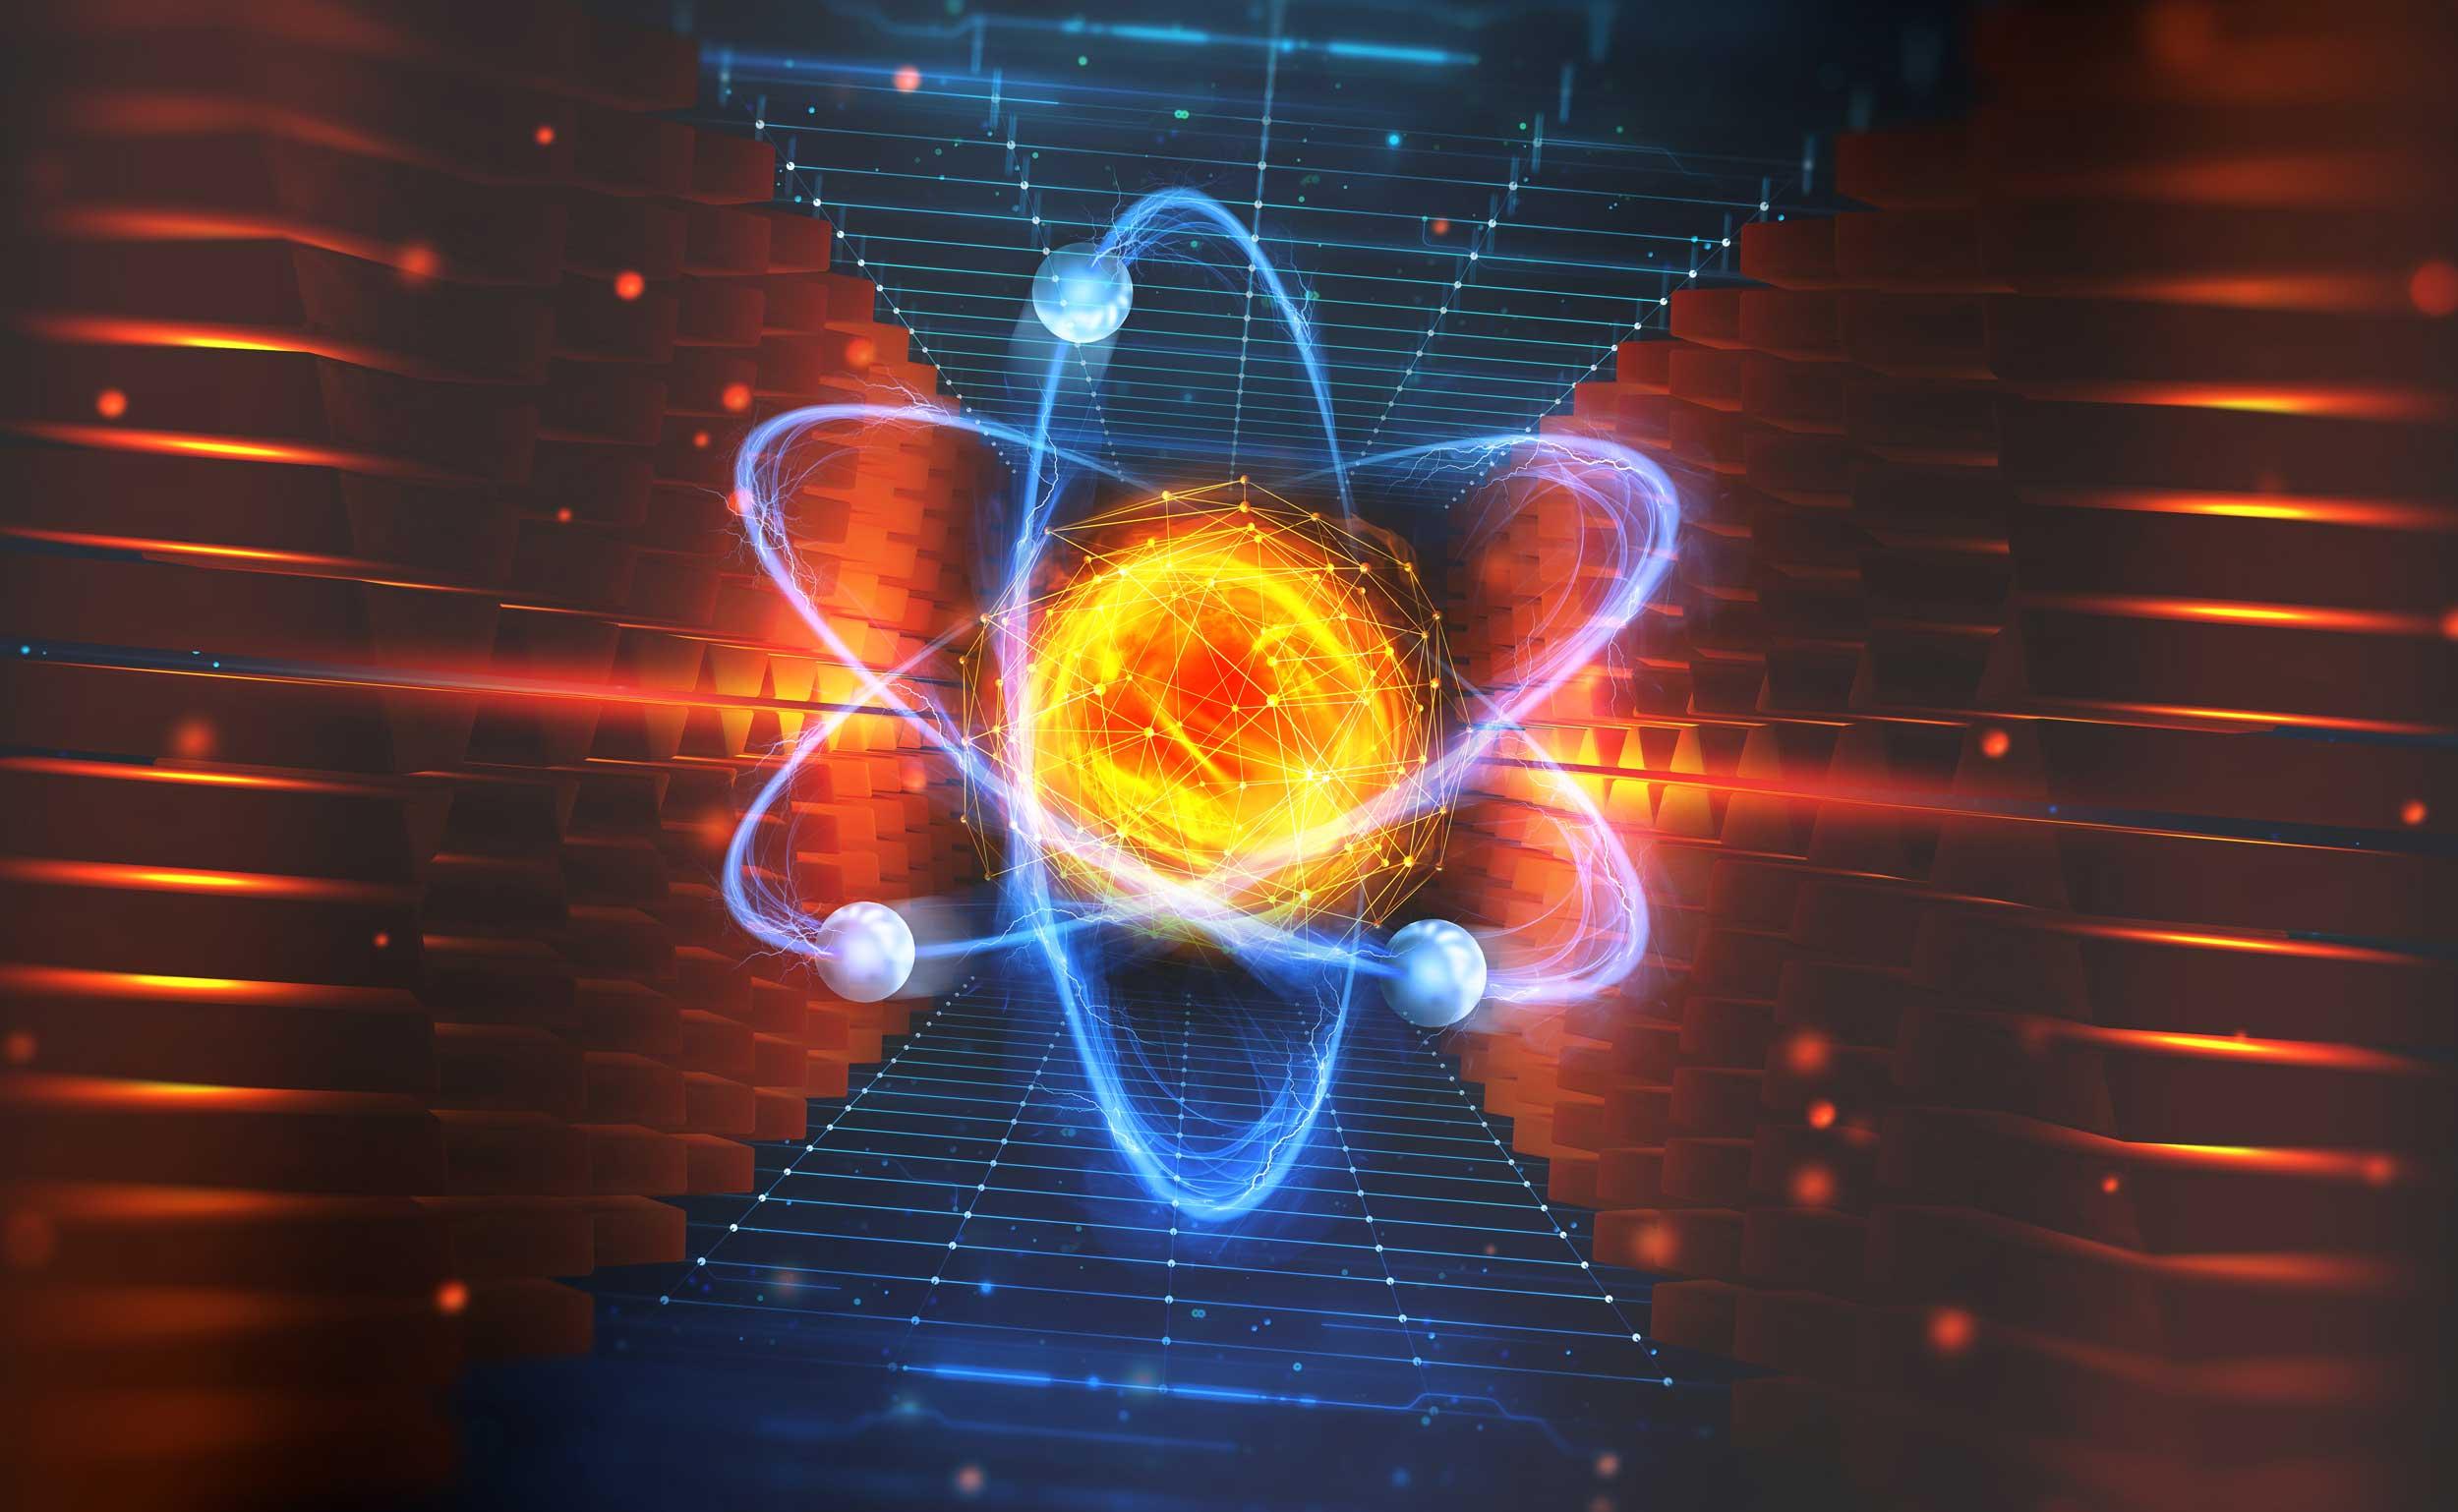 University Particle Collider